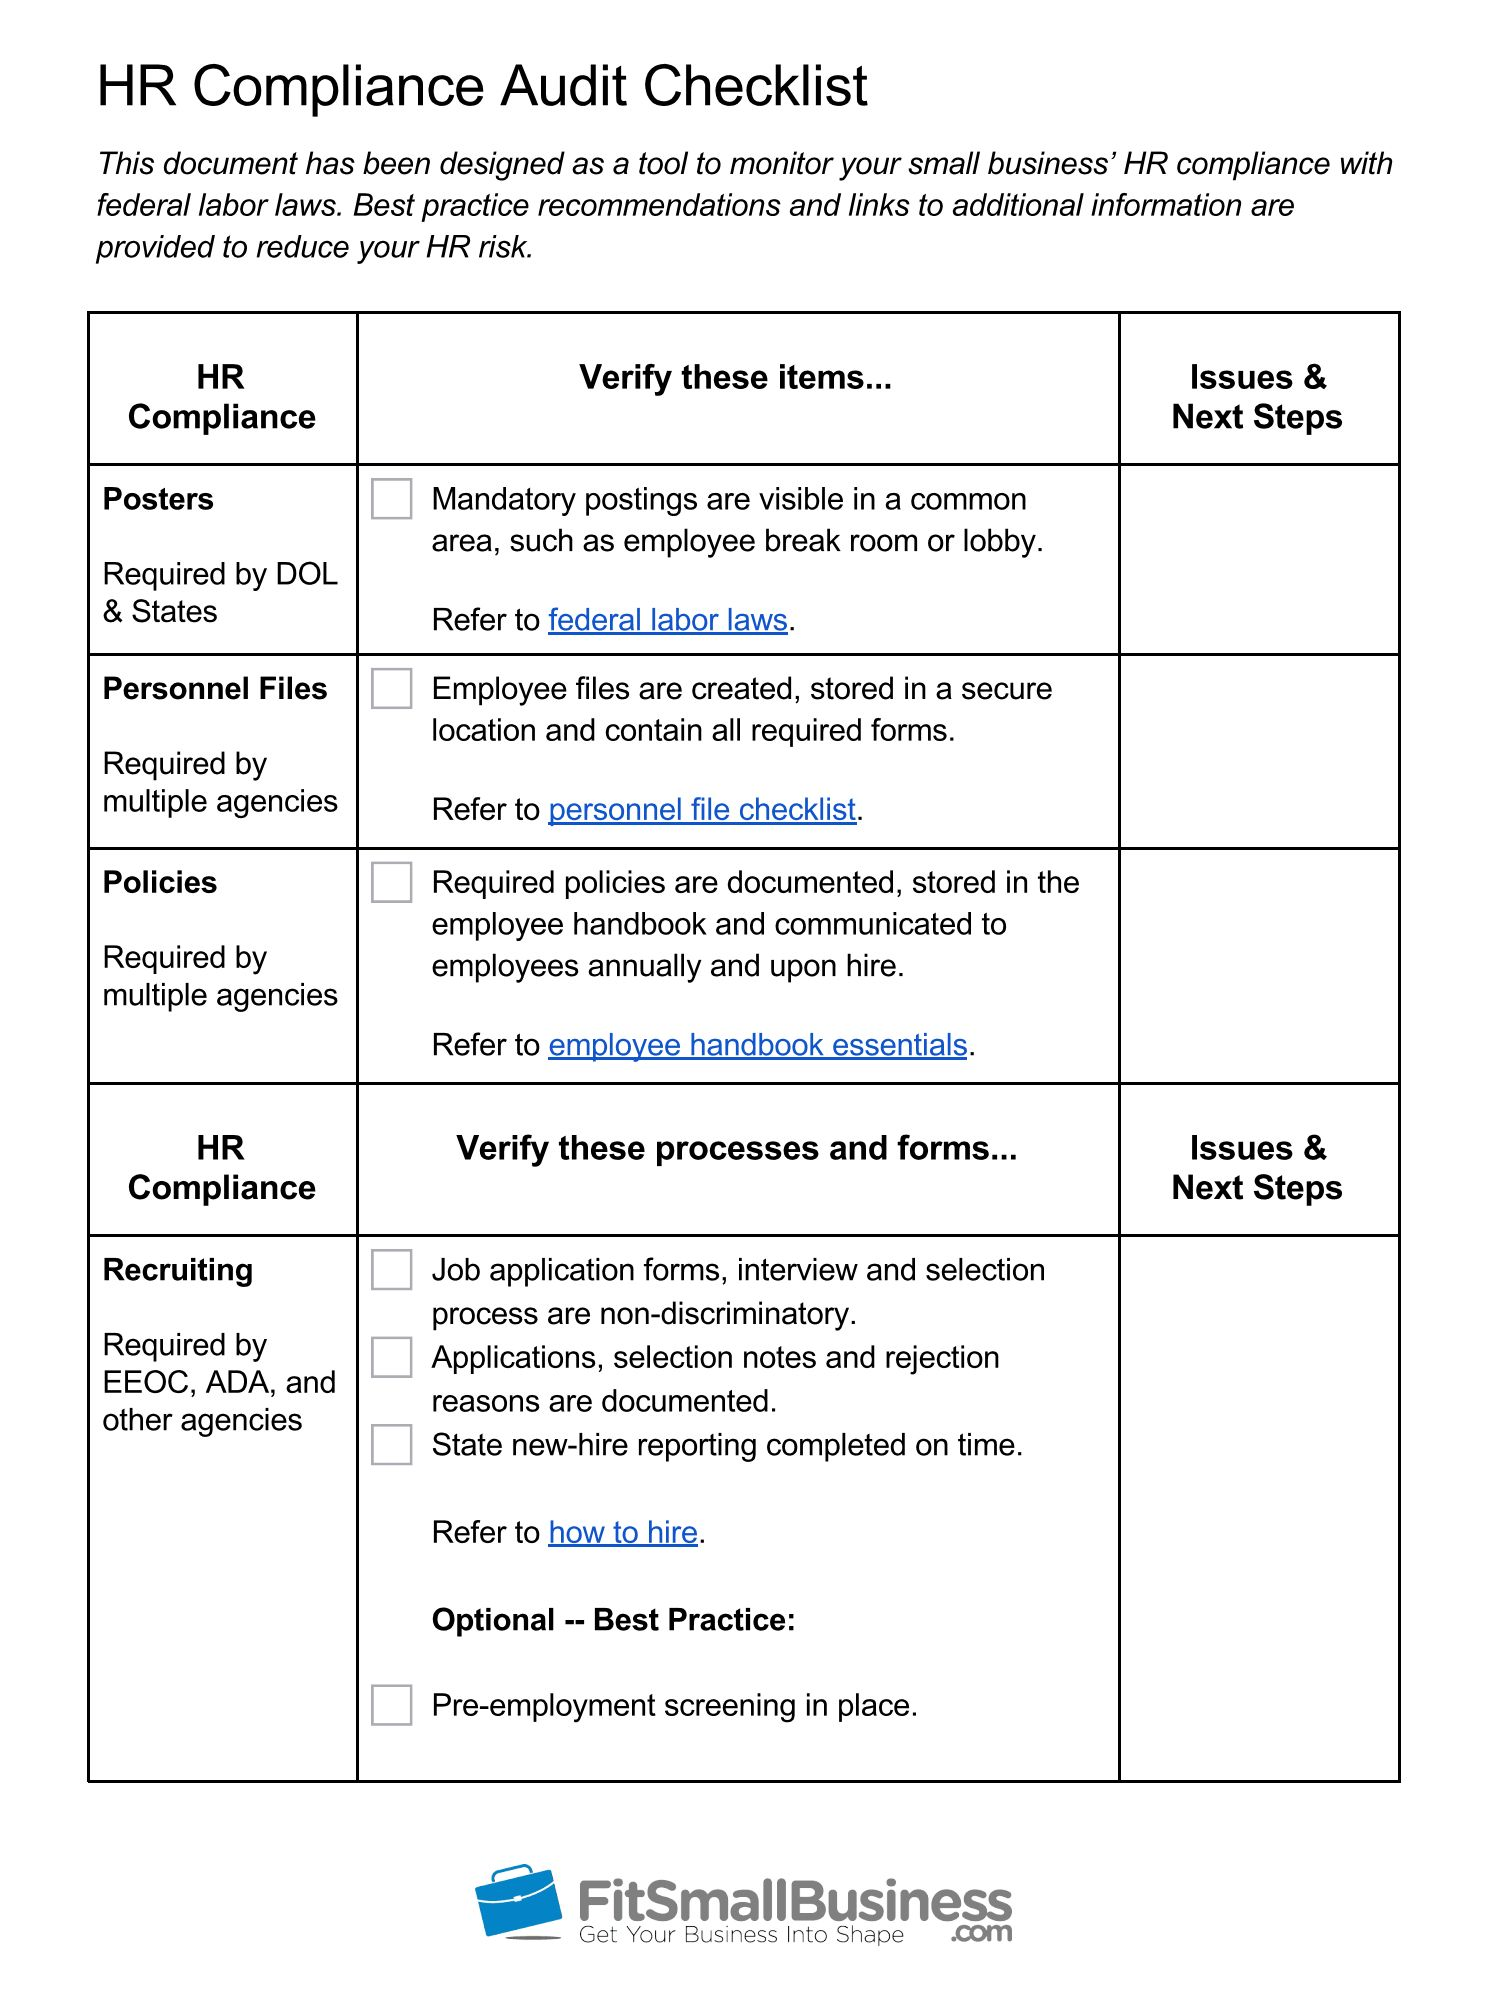 Hr Compliance Definition Free Hr Audit Checklist With Sample Hr Audit Report Template Best Sample Template Audit Checklist Best Templates